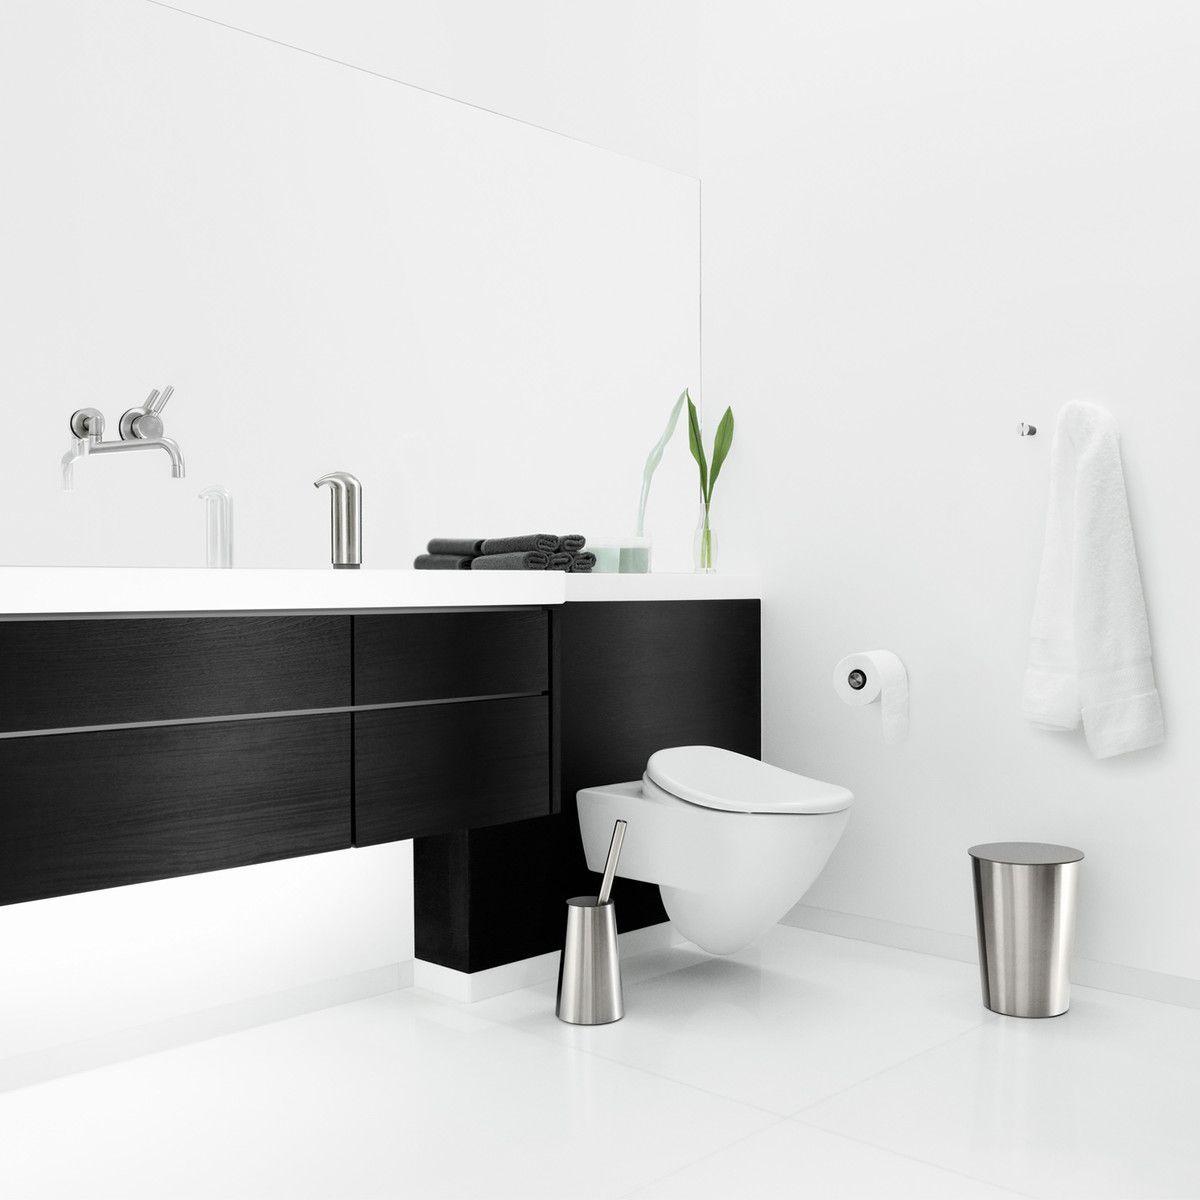 Eva Solo - Seifenspender, matt | Bathroom Decor Ideas | Pinterest ...